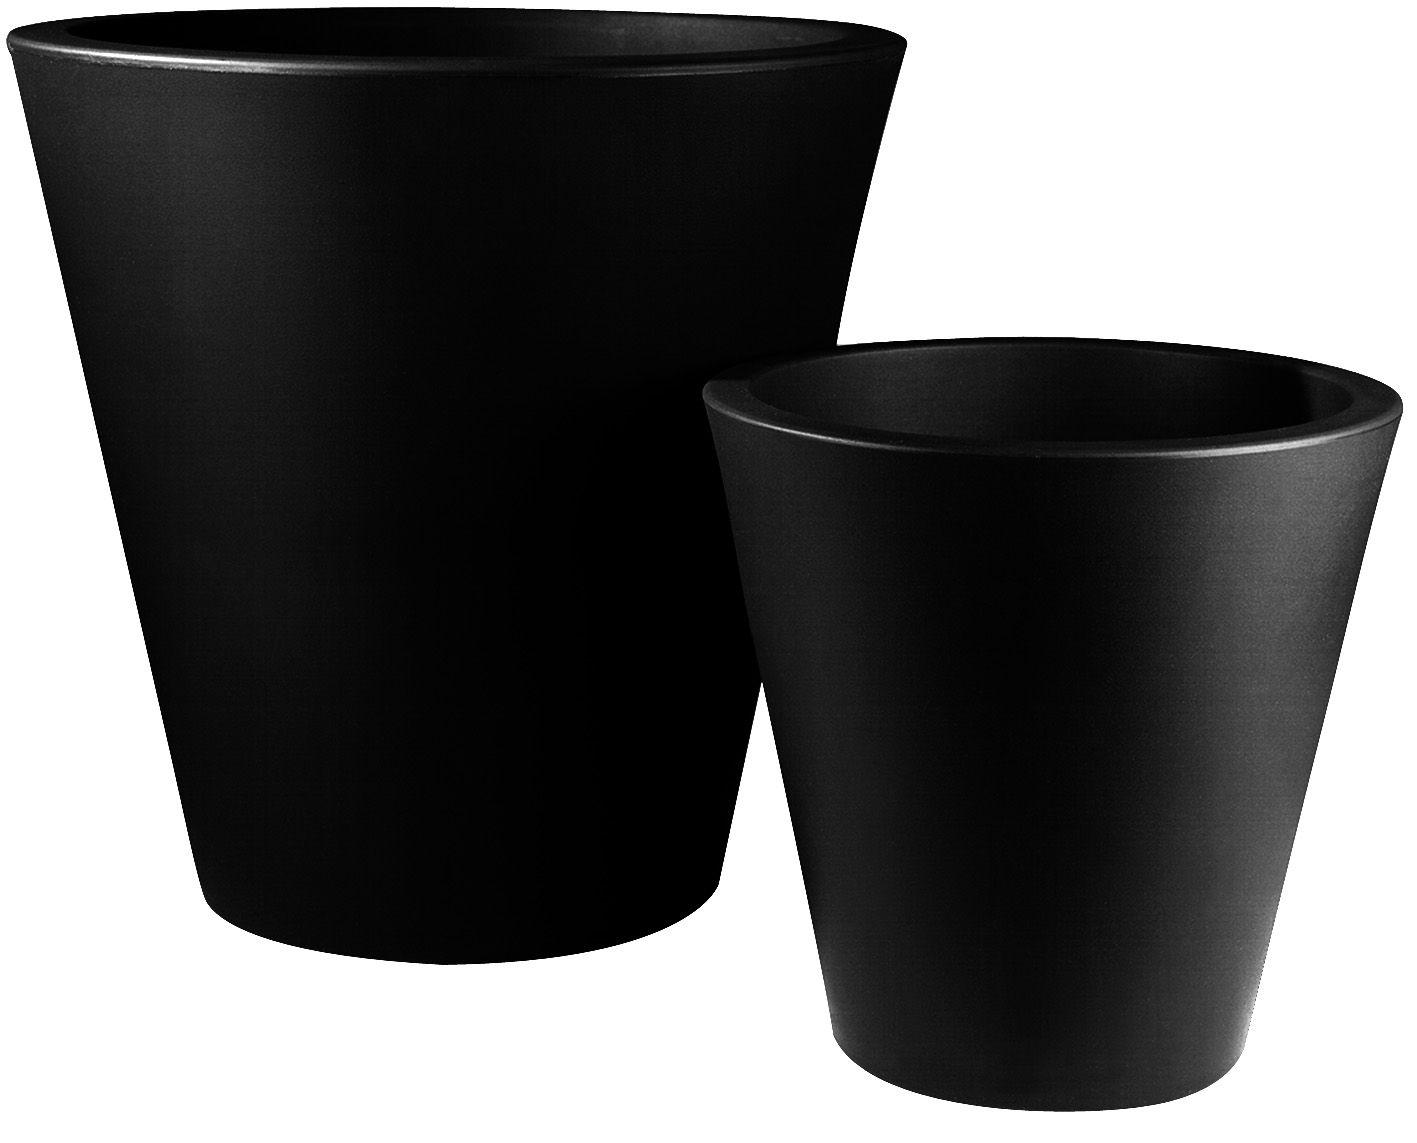 Outdoor - Pots & Plants - New Pot Flowerpot - H 60 cm by Serralunga - Black - Polythene